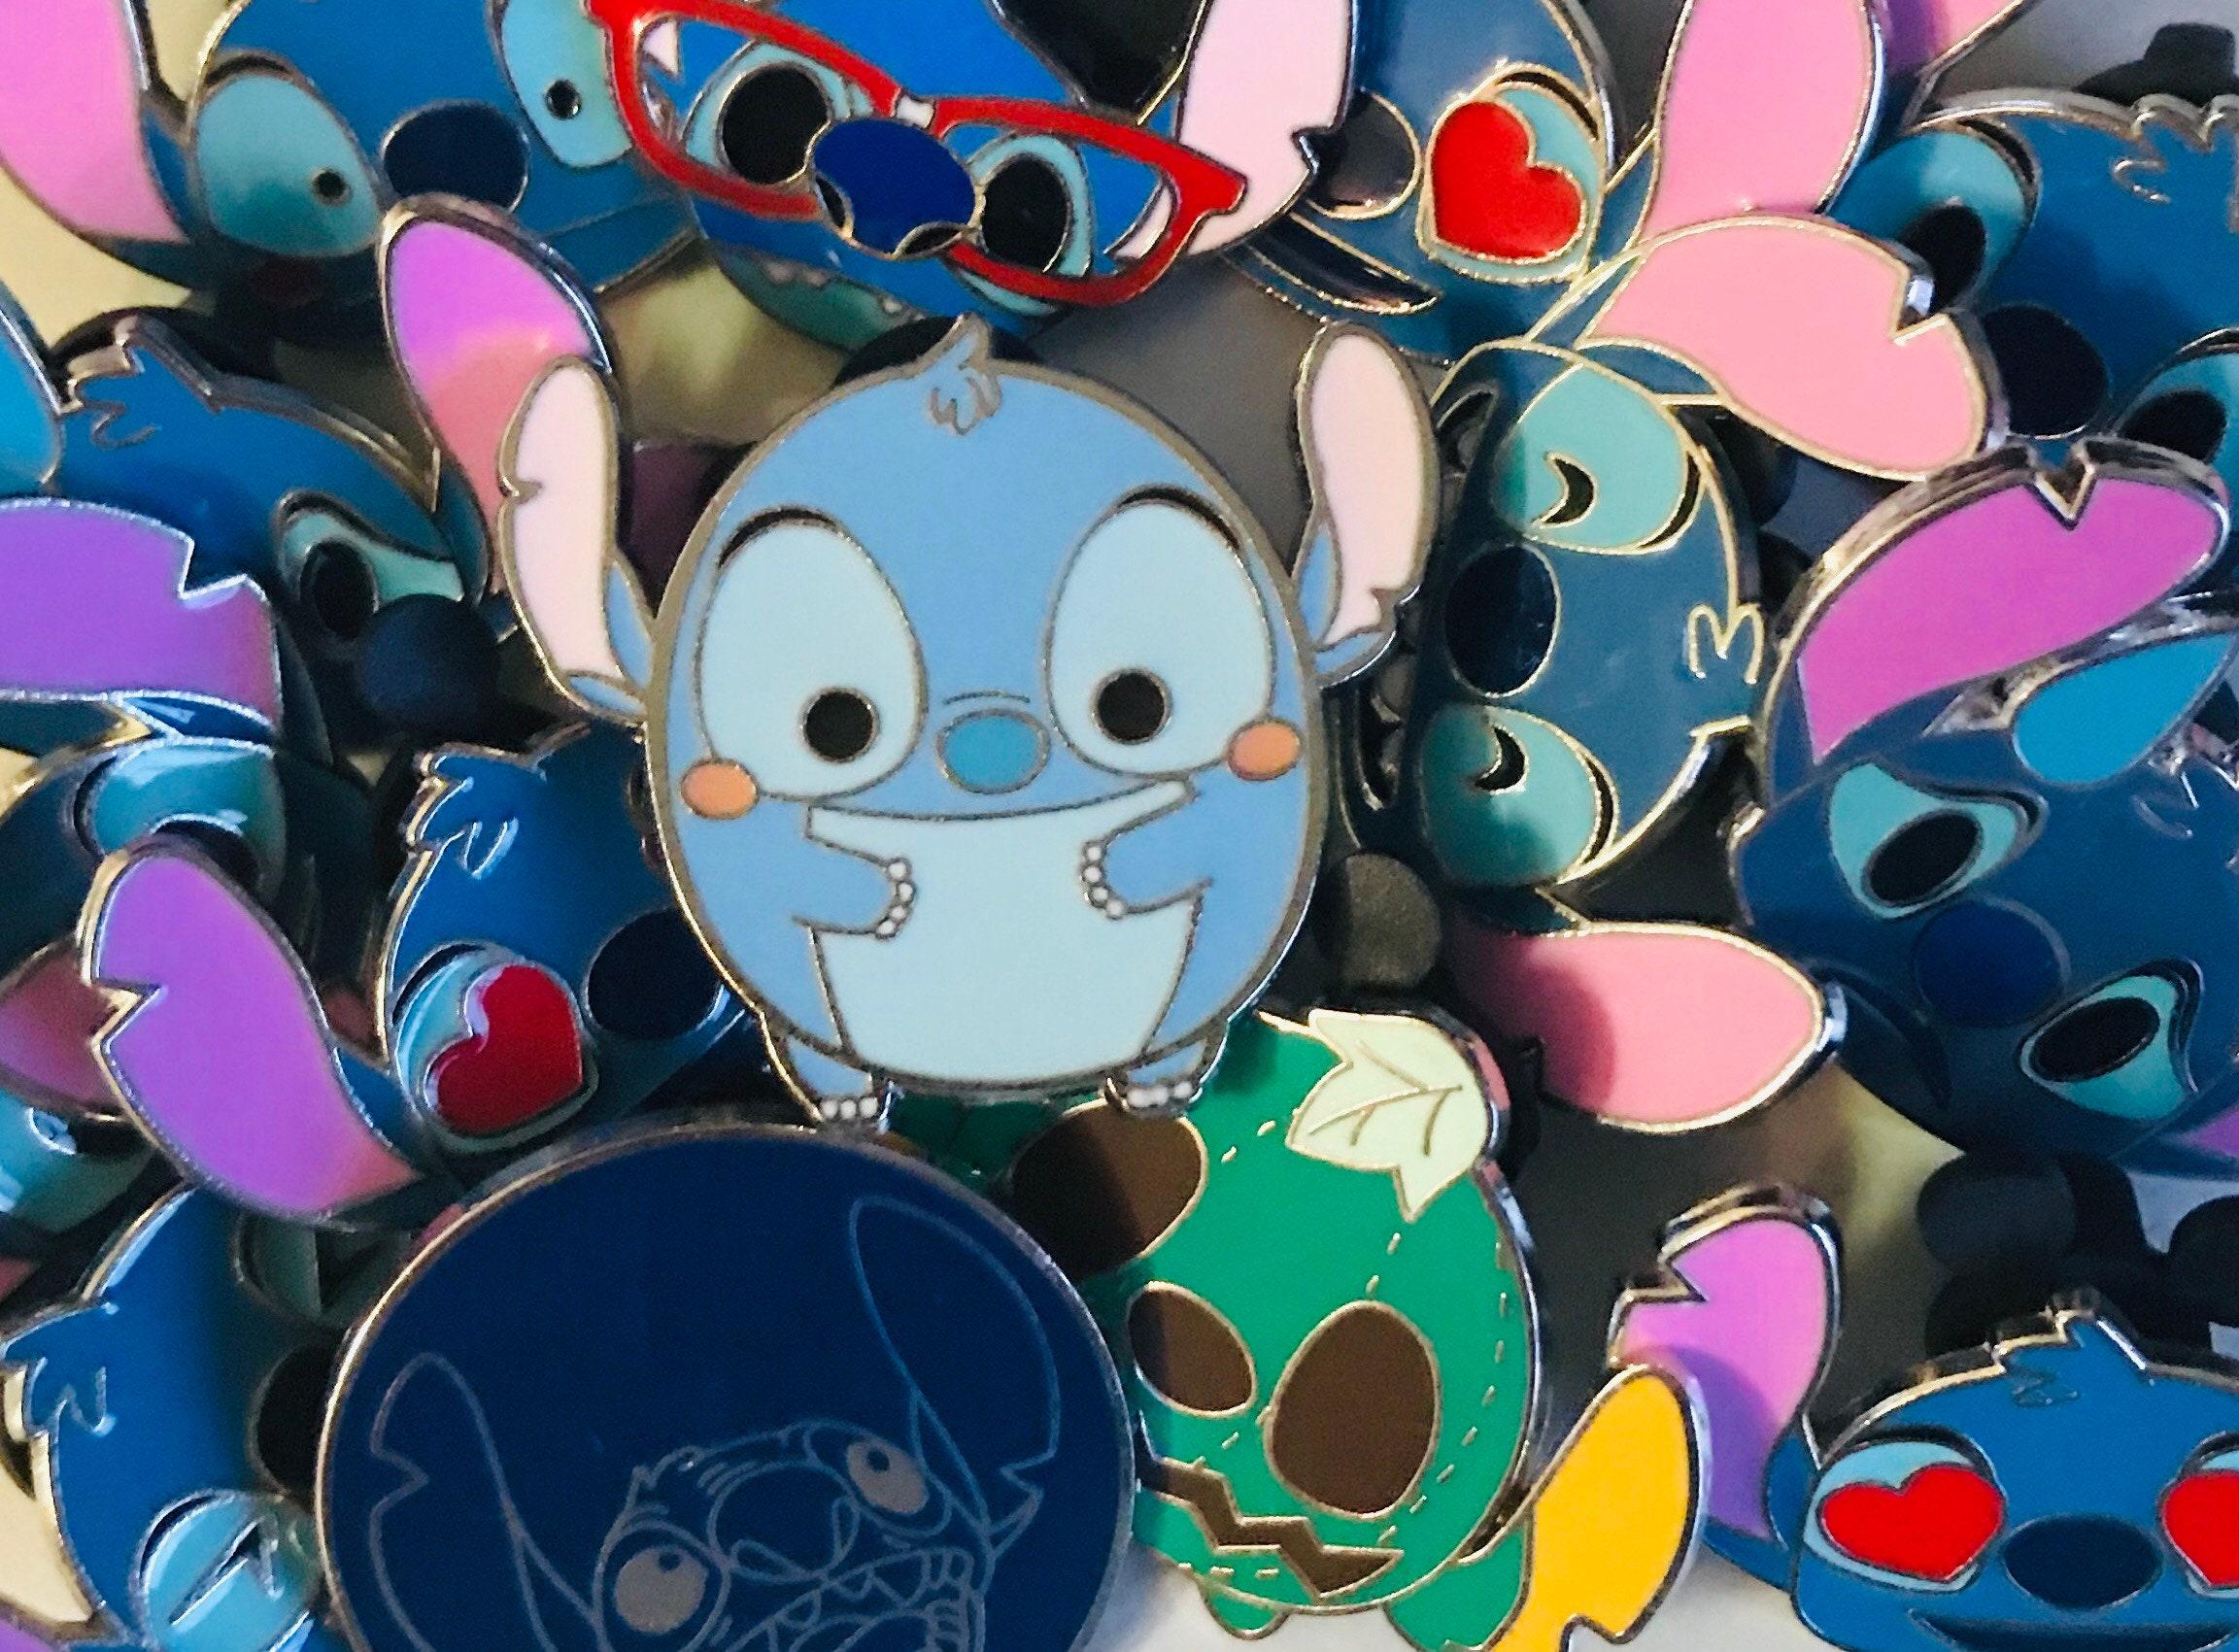 15 20 100/% Tradeable Disney Pins NO Duplicates FREE SHIPPING 10 Disney Trading Pin Bundles 5